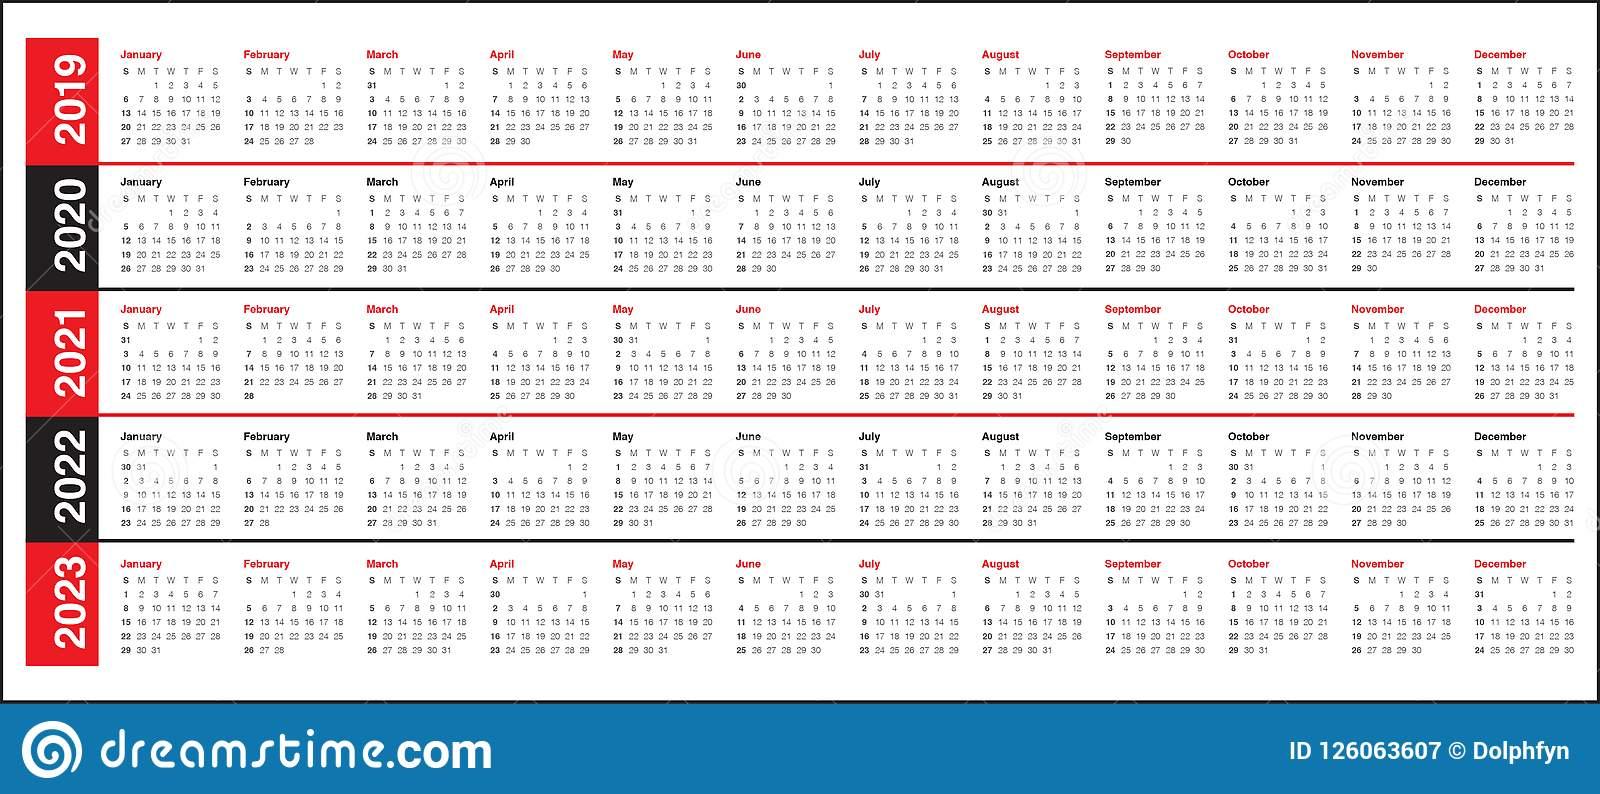 Free Prinable Calenders 2020 To 2023   Calendar Template Regarding 4 5 4 Retail Calendar 2019 2022